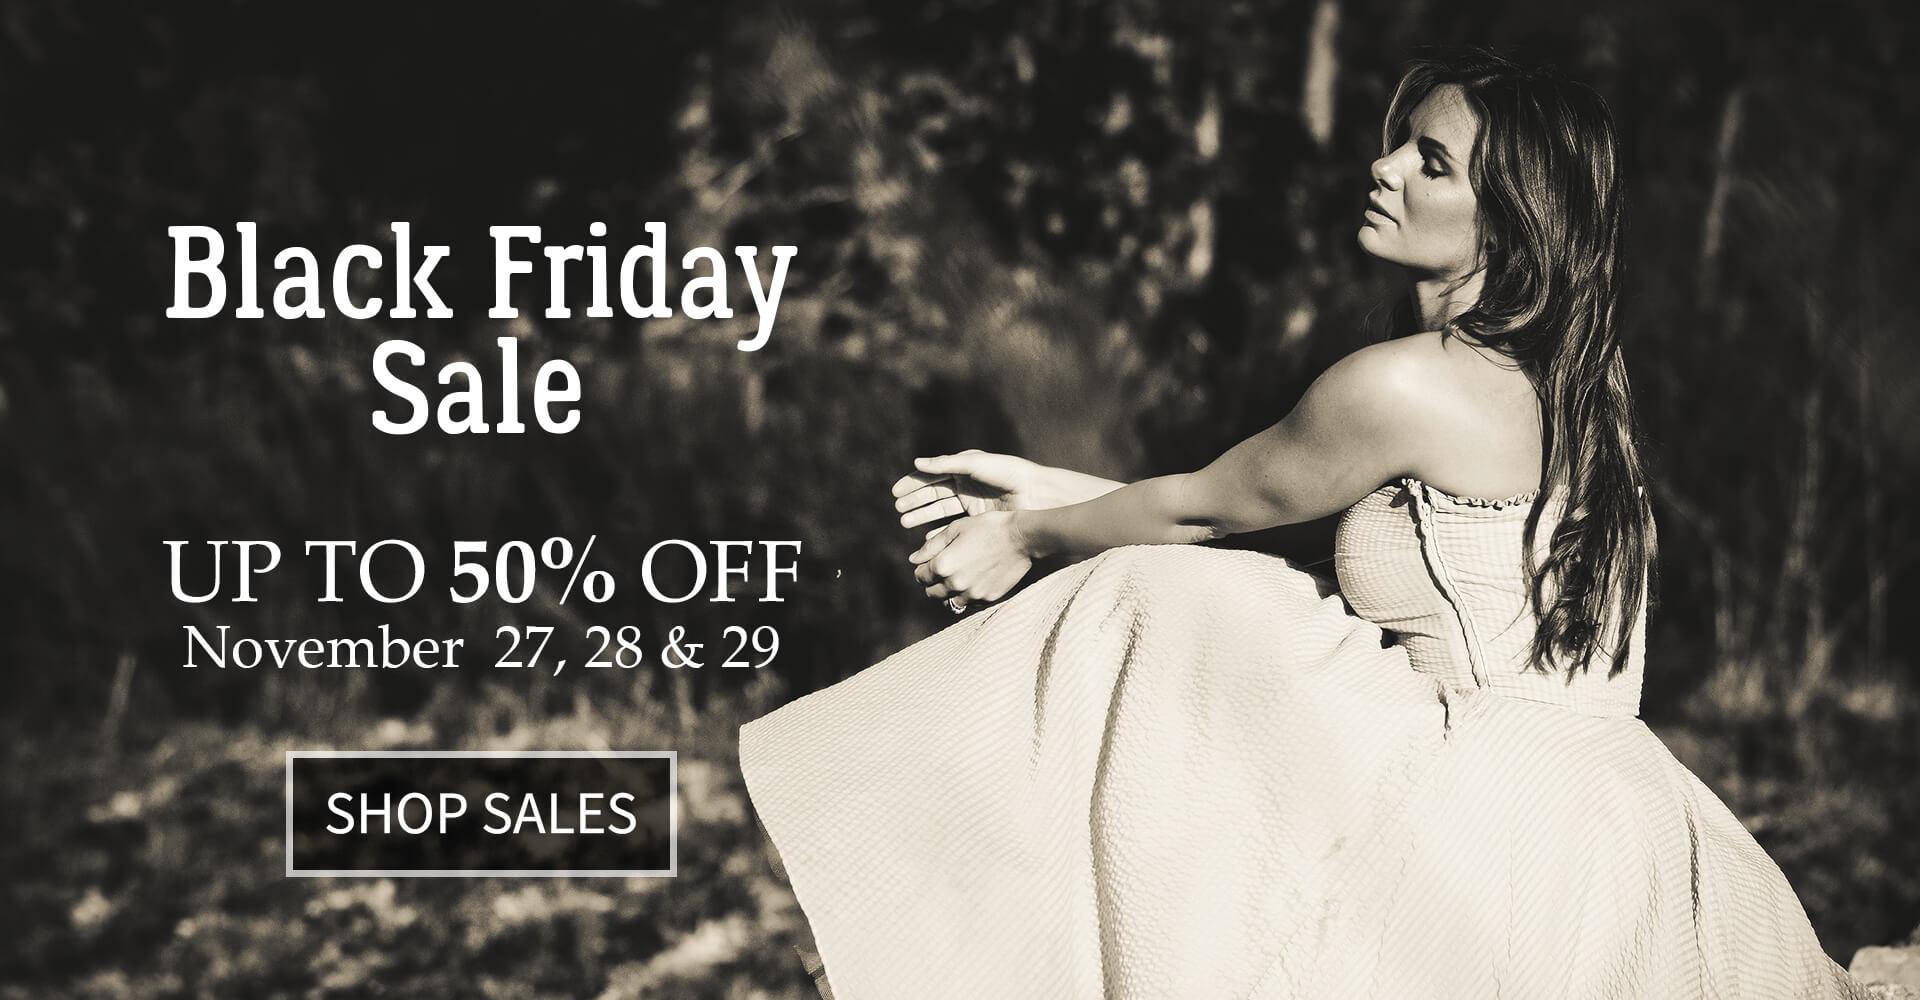 Seaflora Skincare Black Friday Sale